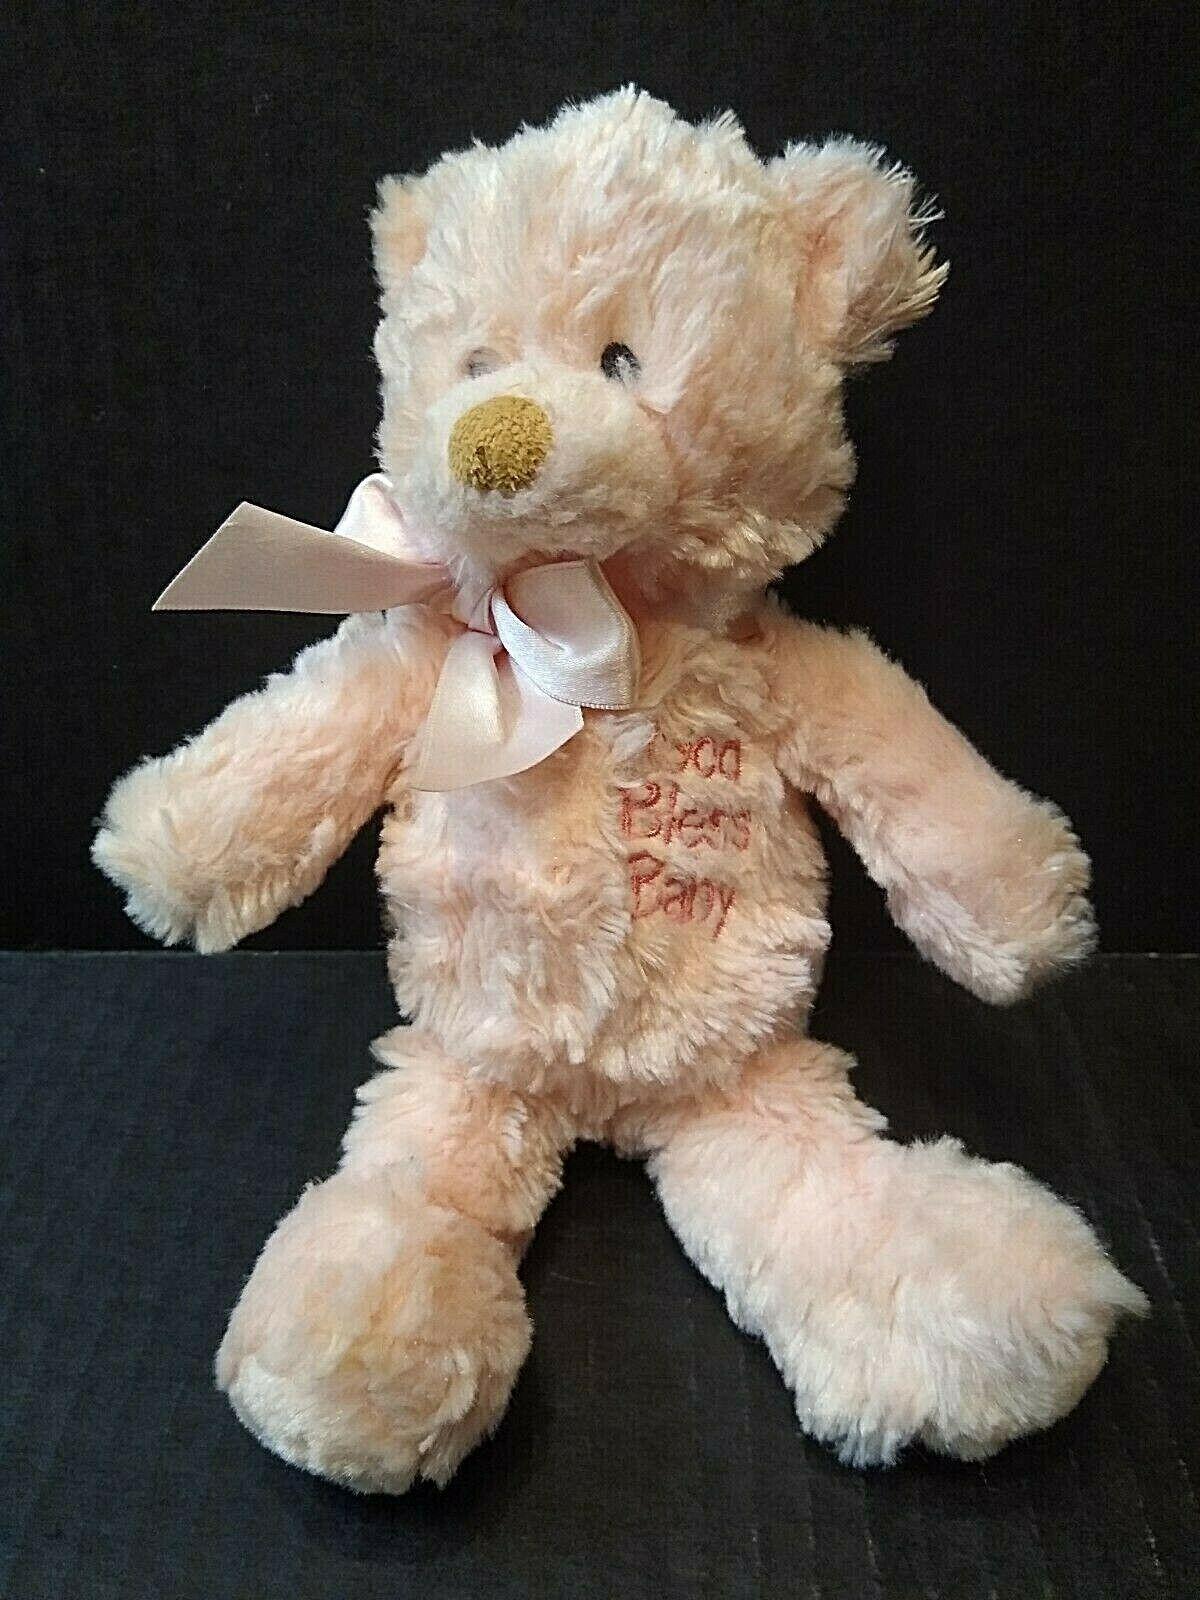 Baby Gund Plush Teddy Bear God Bless Tiny Faith Stuffed Animal Teddy Bear Plush Plush Stuffed Animals Vintage Plush [ 1600 x 1200 Pixel ]